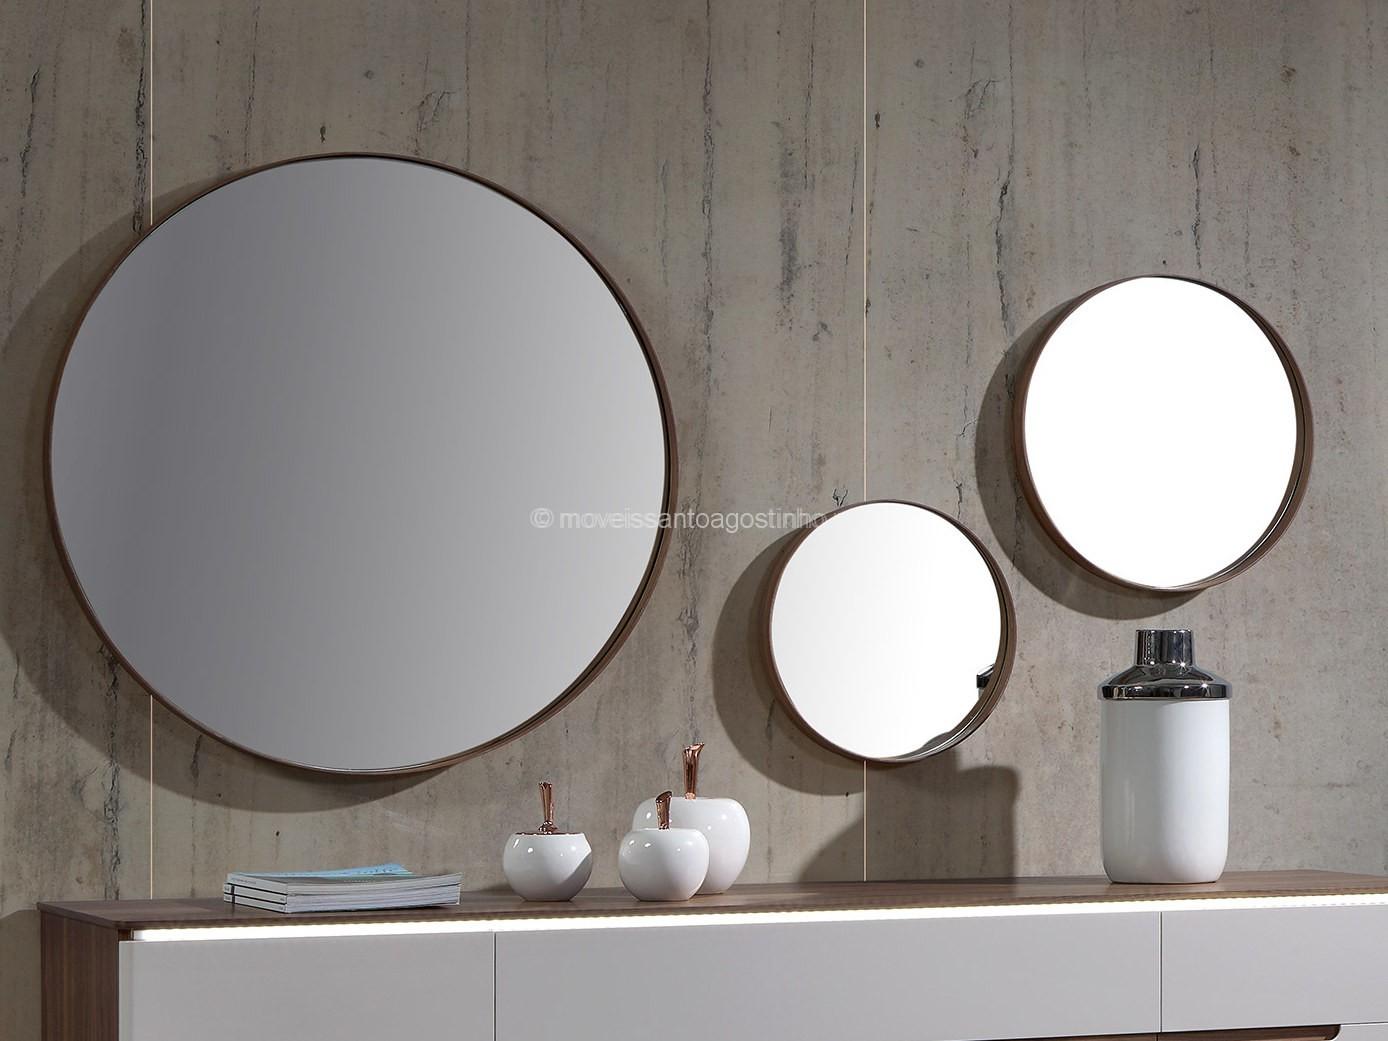 Espelhos redondos Kenzo